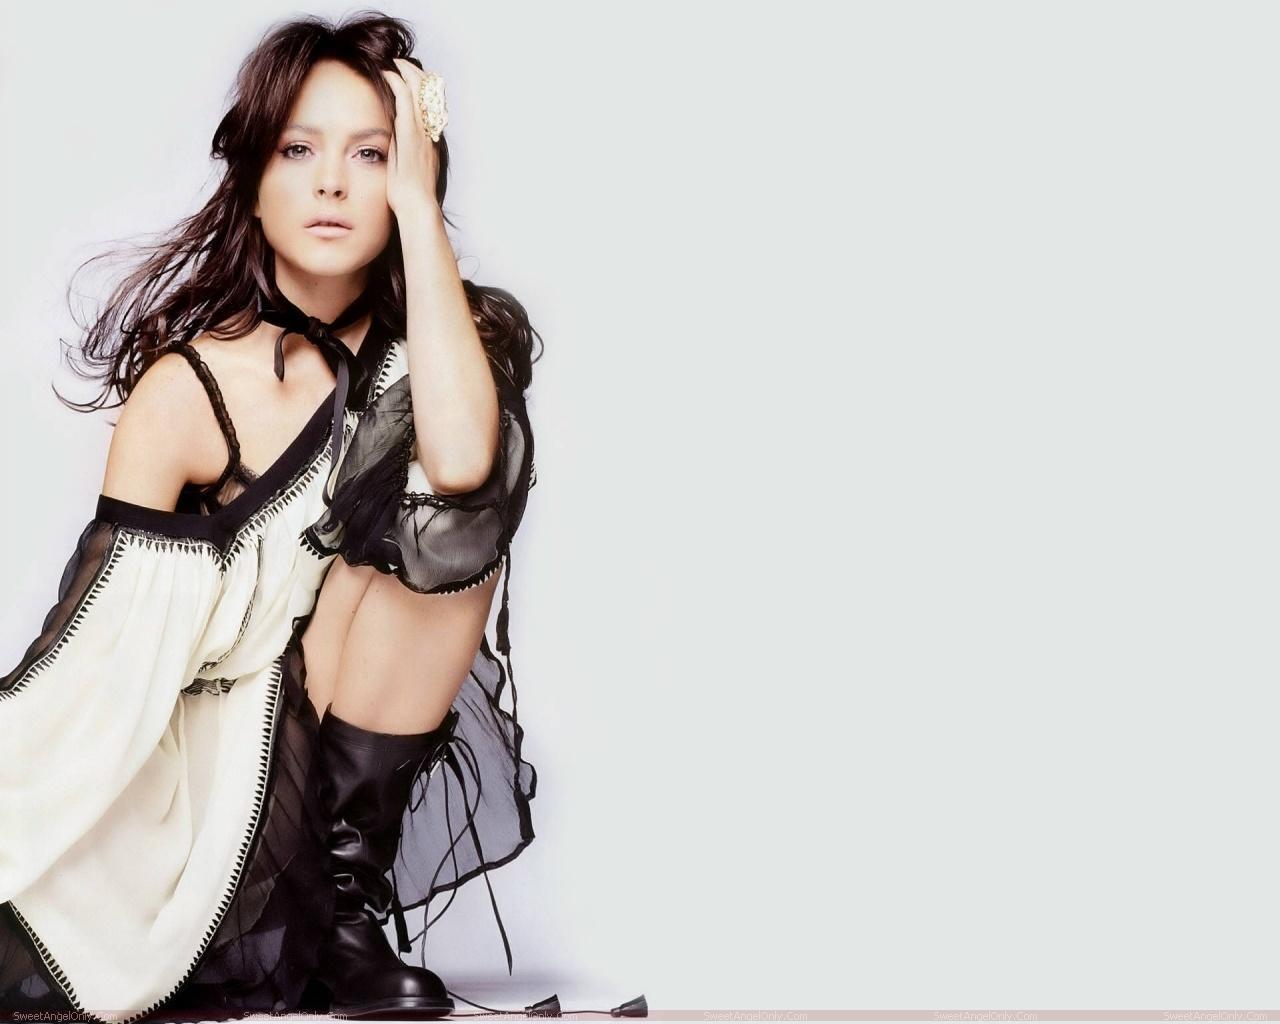 http://2.bp.blogspot.com/-wXFxnrviI04/TYbvQI7hGyI/AAAAAAAAFs0/yqUZdn8oPzs/s1600/lindsay_lohan_hollywood_hot_actress_wallpaper_sweetangelonly_07.jpg